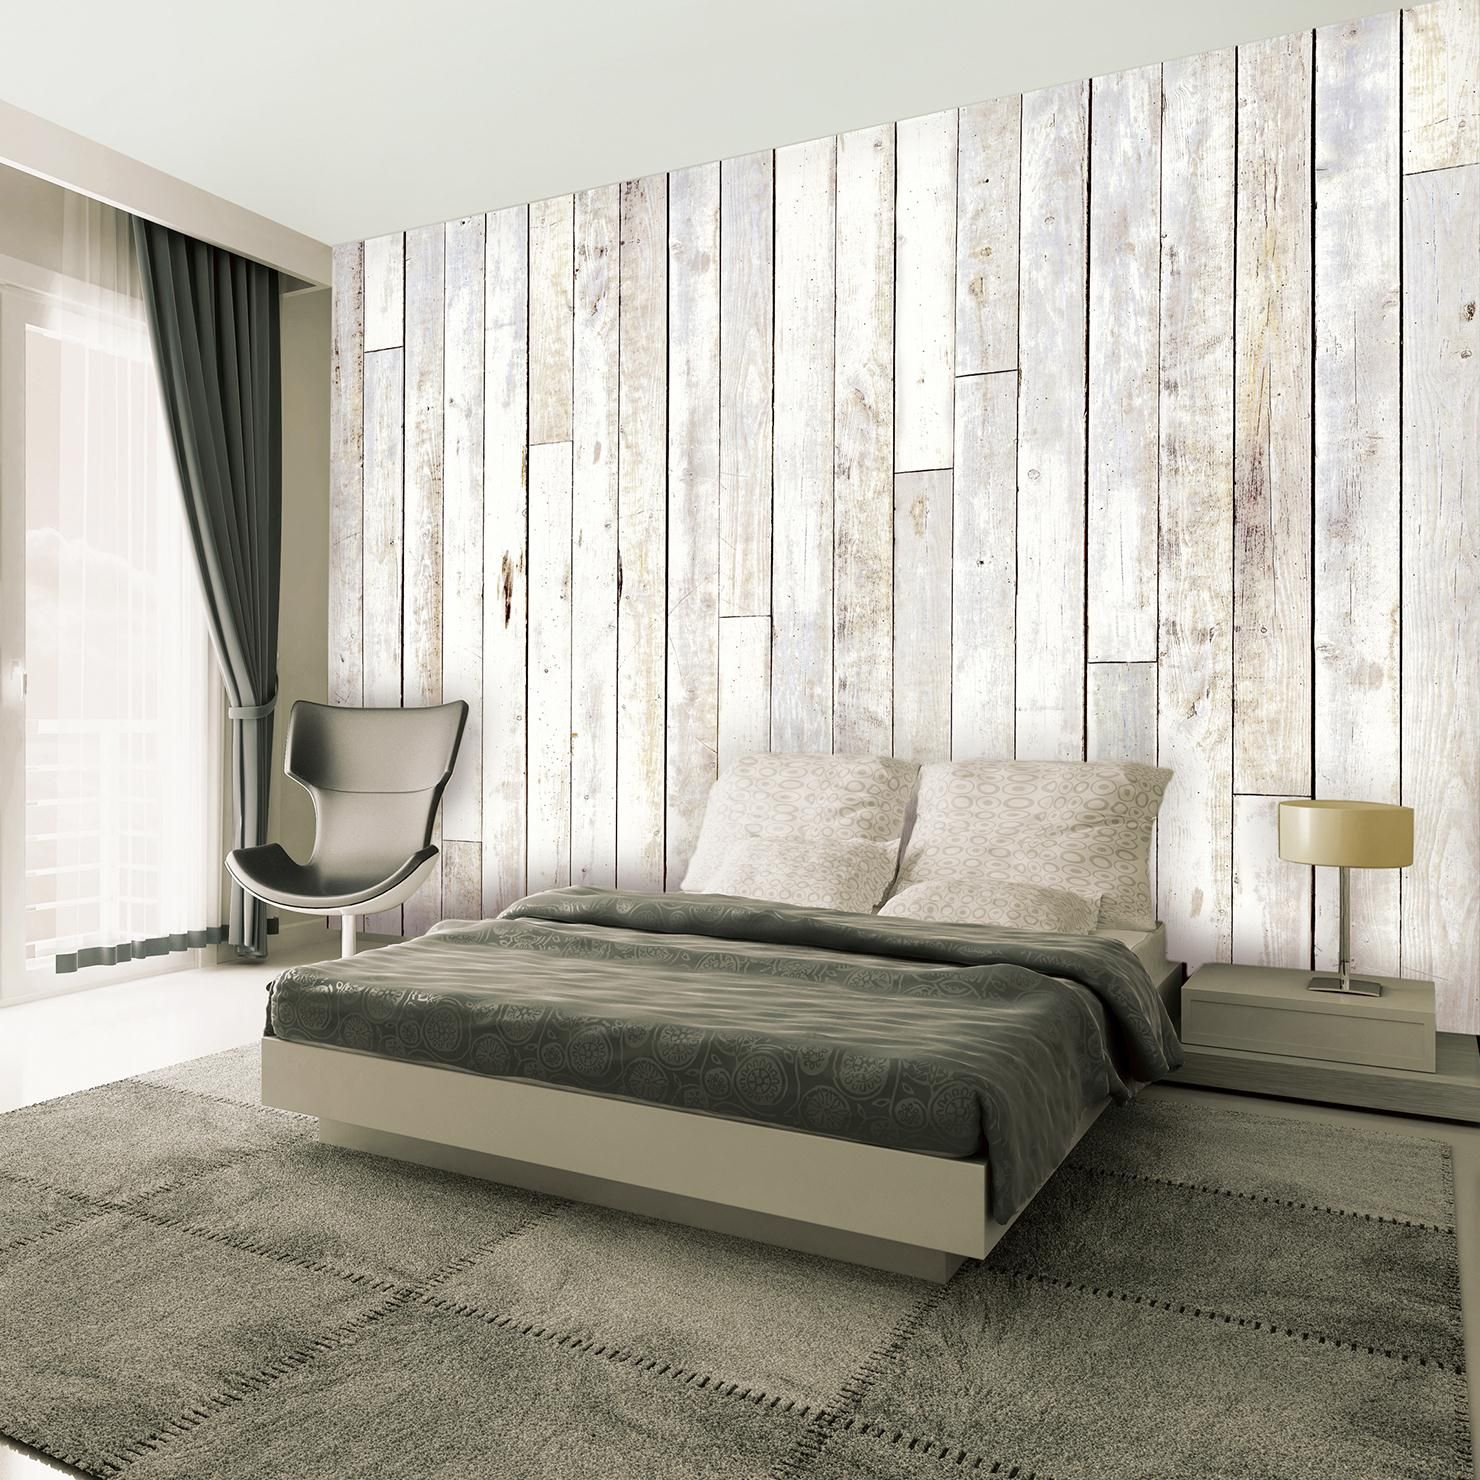 1 wall papier peint bois achica